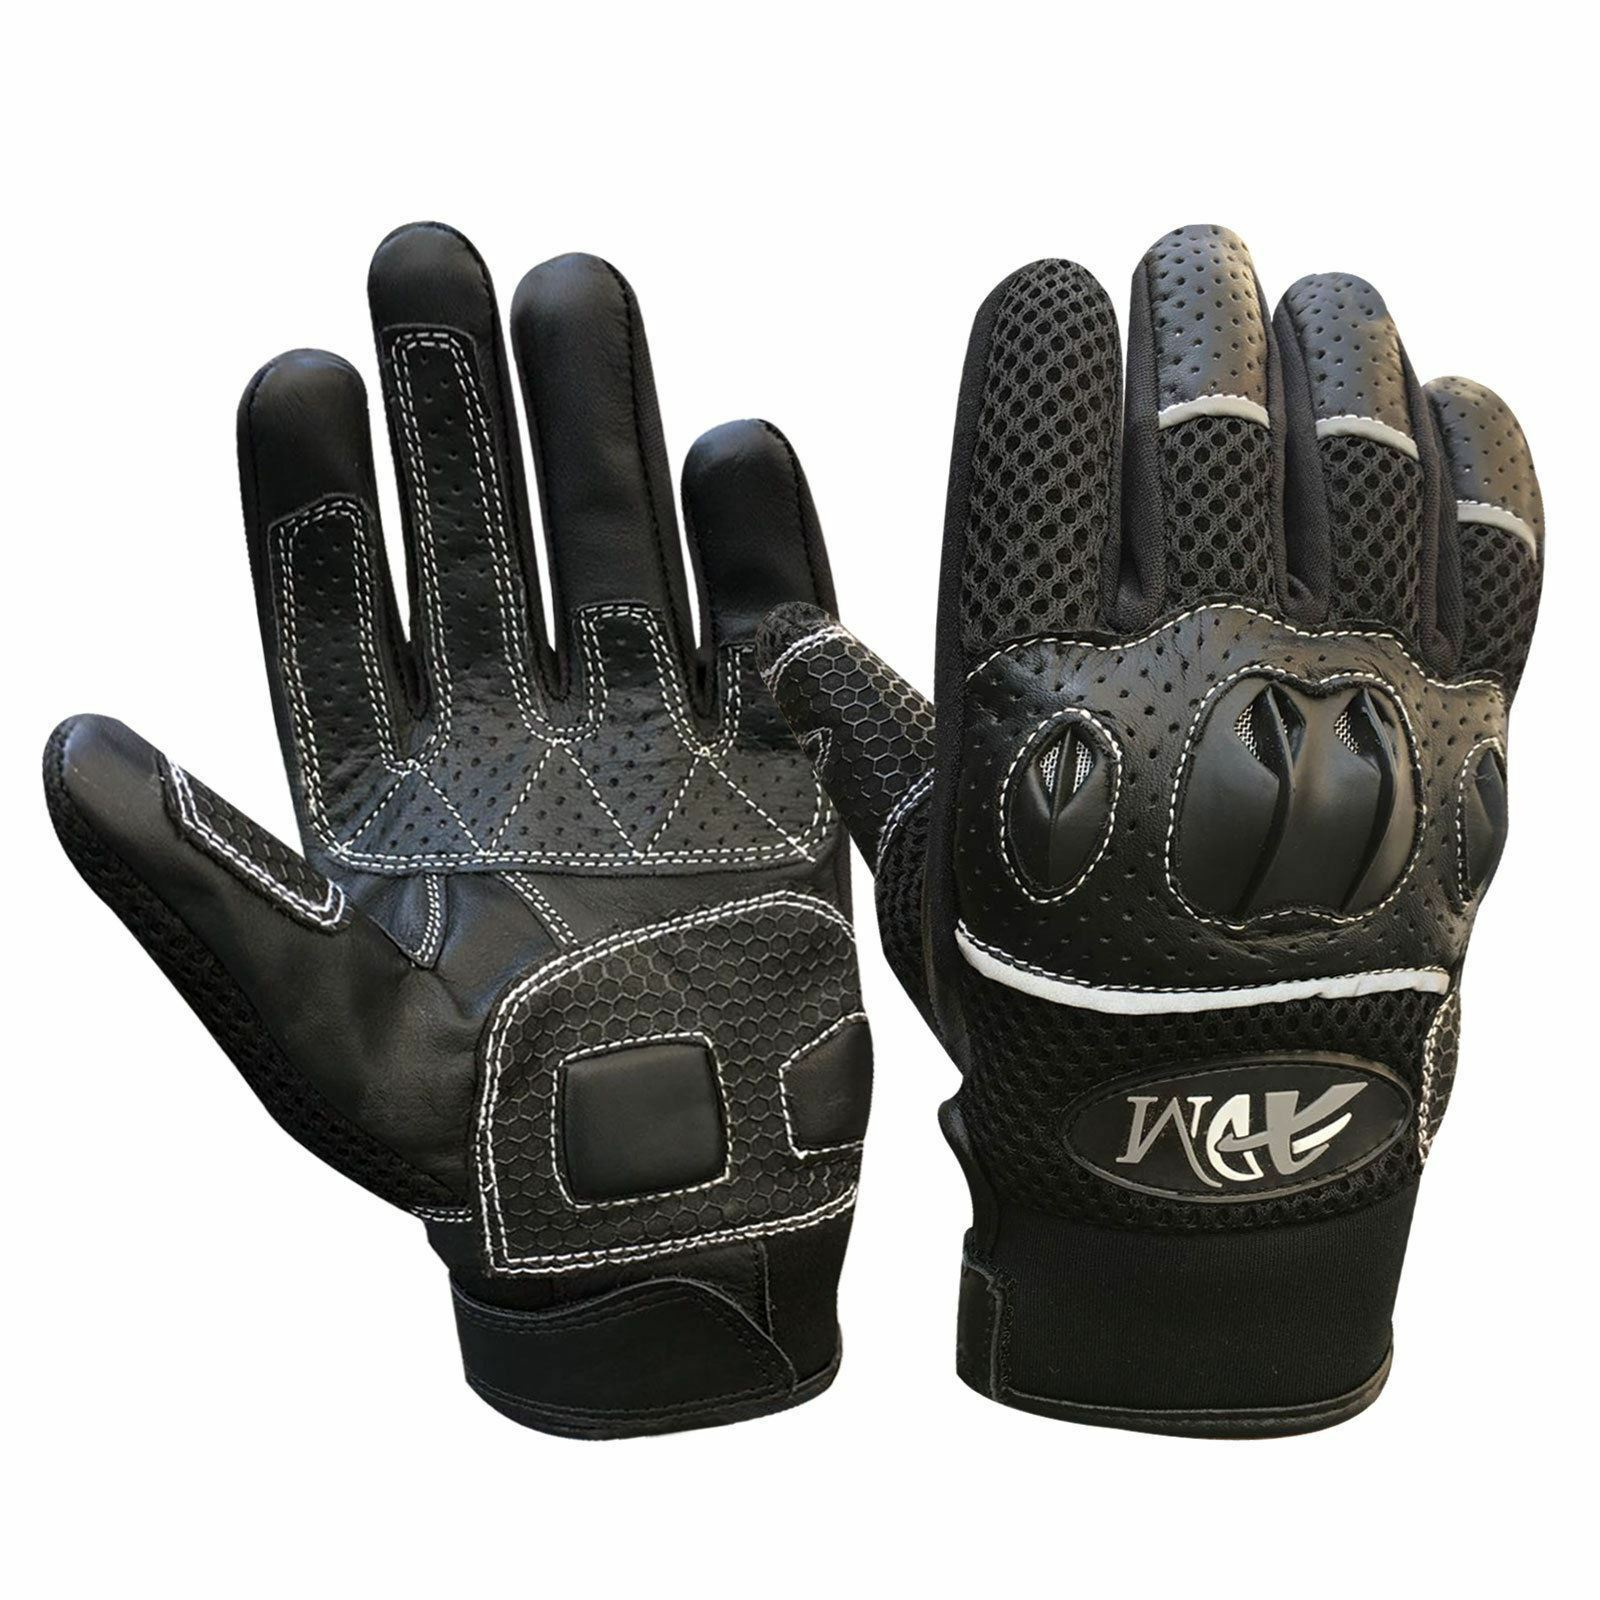 Full finger Winter//Summer Motorbike Motorcycle Racing Motocross Pro Biker